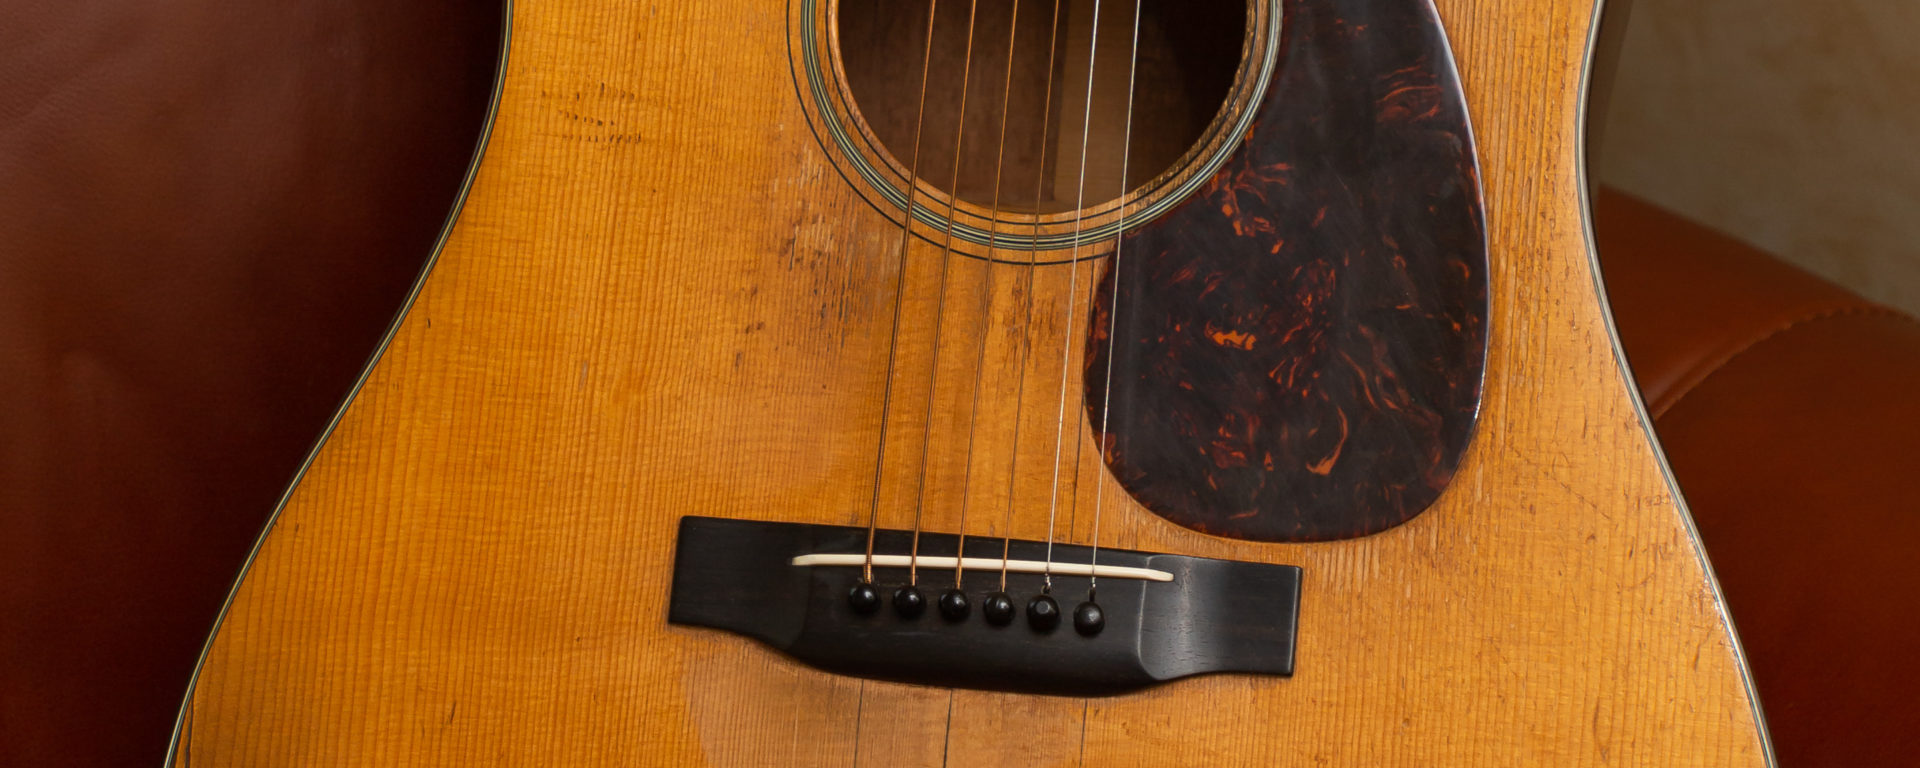 Martin Acoustic Guitars - 1941 D-18